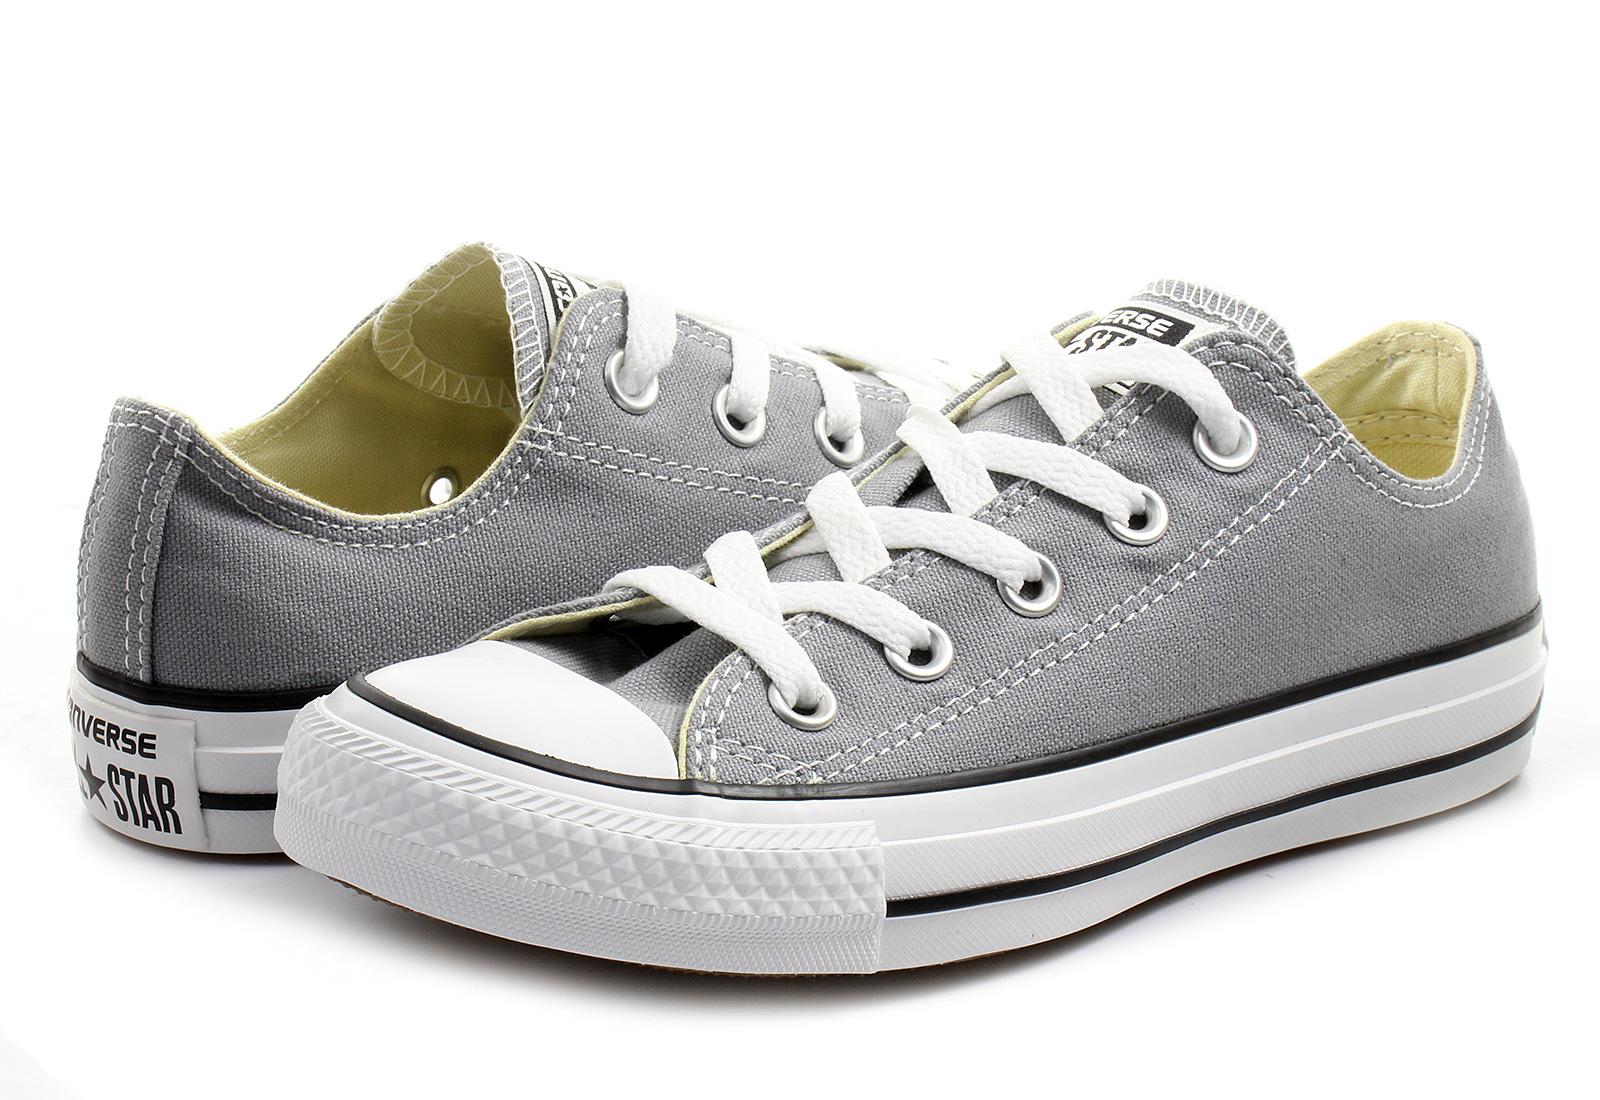 b739fd2fb83 Converse Sneakers - Chuck Taylor All Star Seasonal Ox - 147137C ...